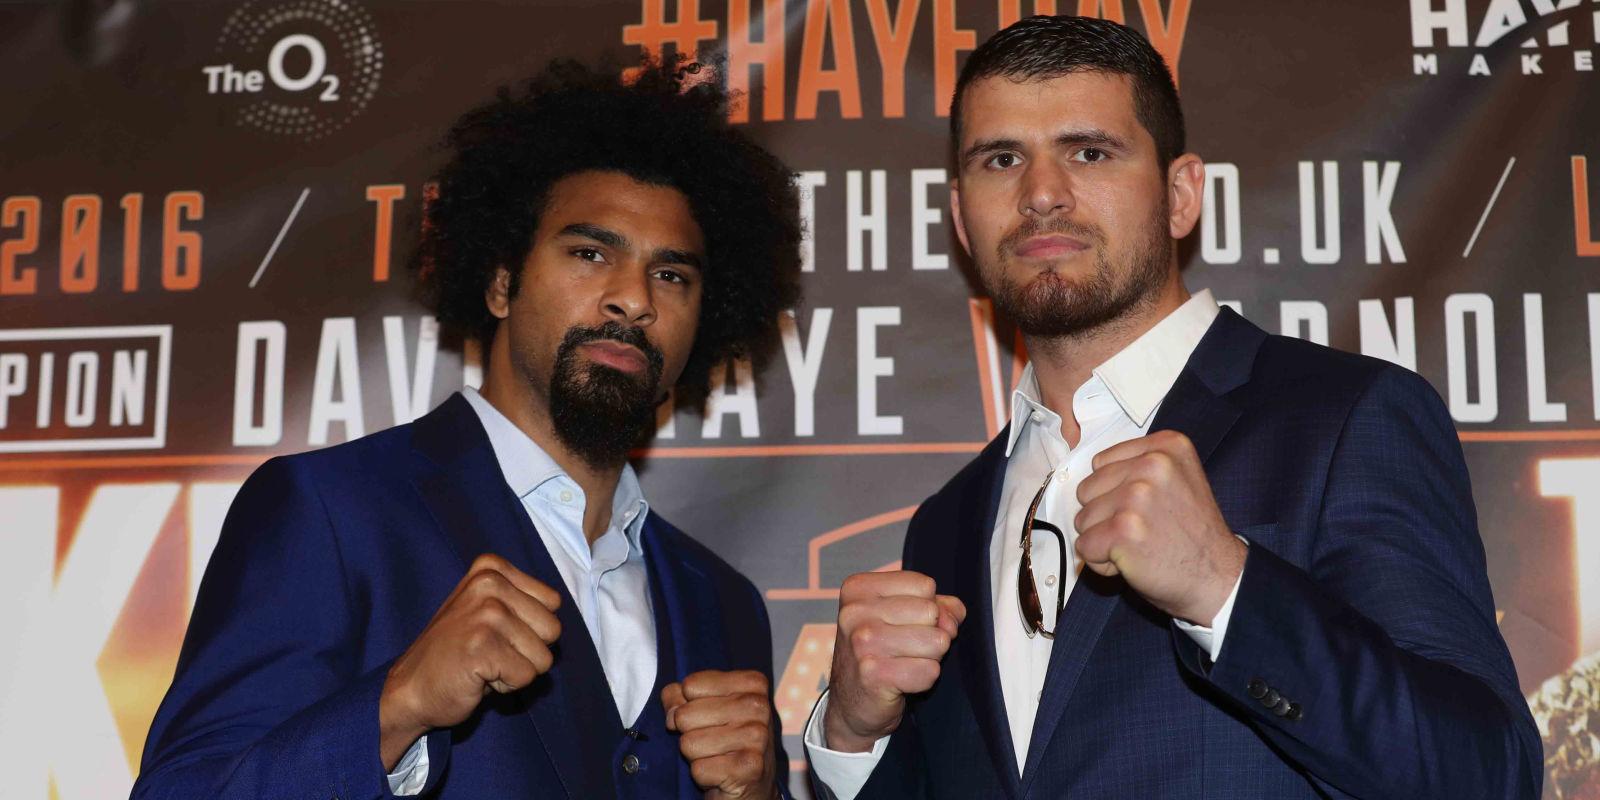 david hayes next fight